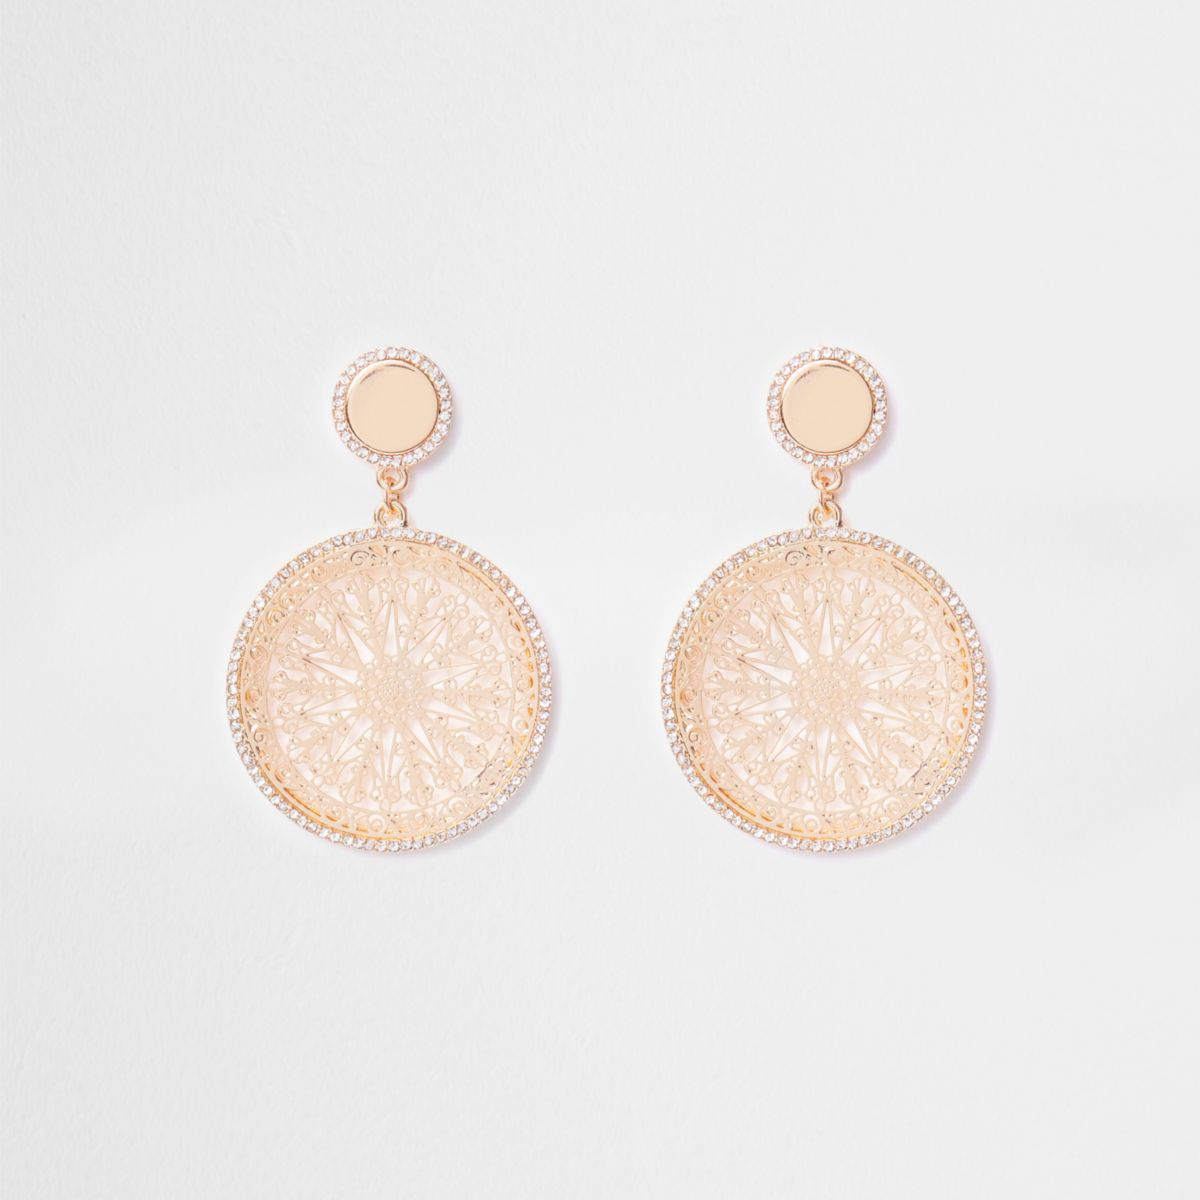 Gold tone filigree disc drop earrings